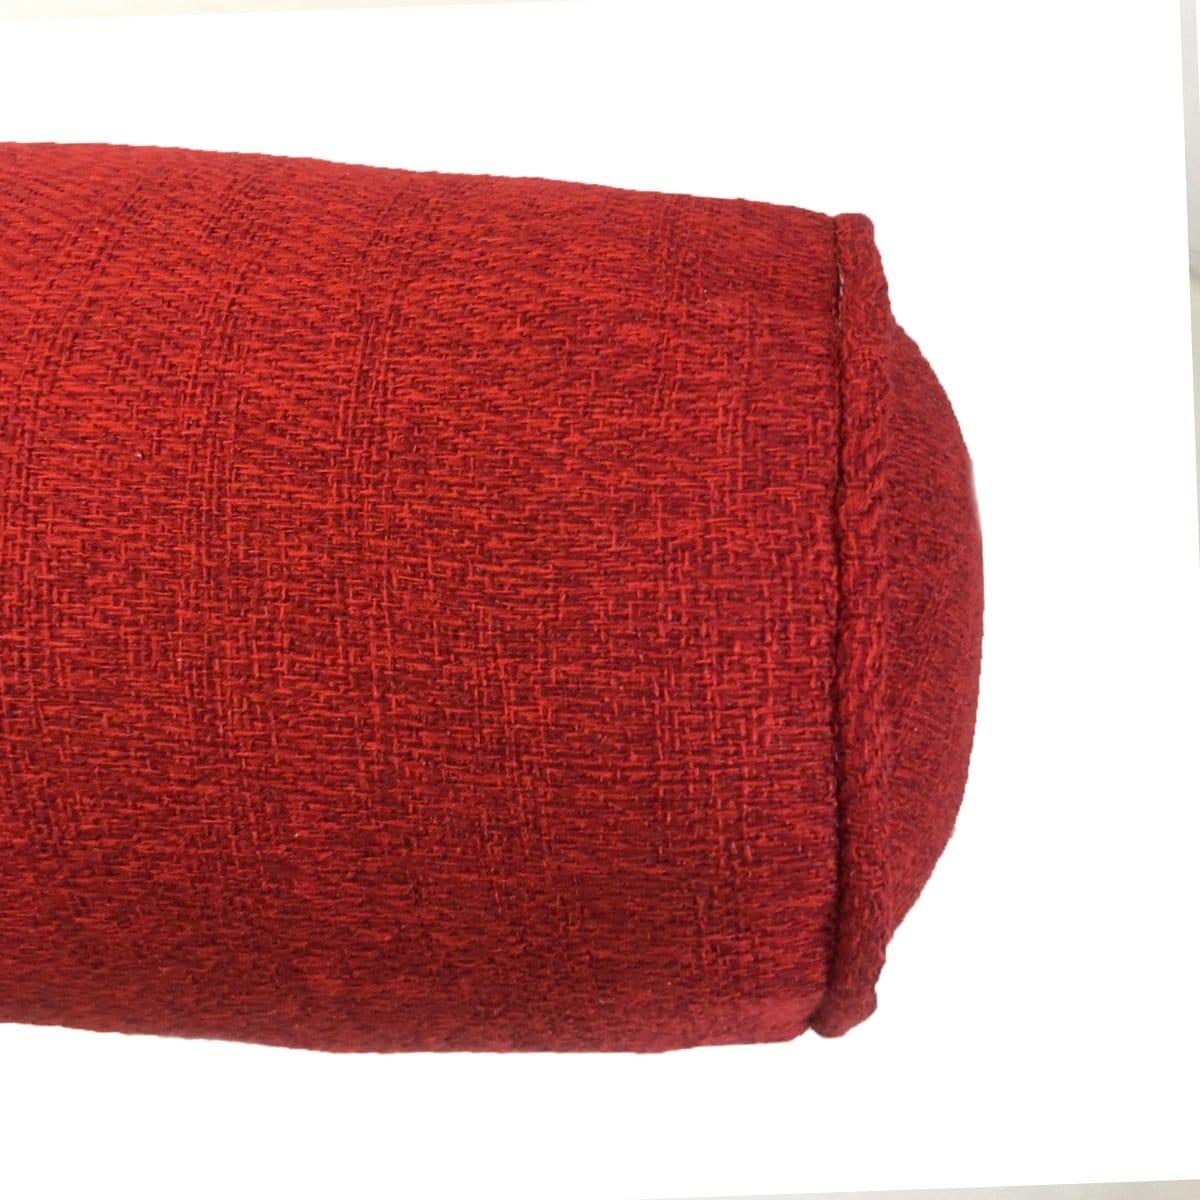 Cojín Cilindro 15 X 45 Ragnar Ruby Rojo Rojo Cassia